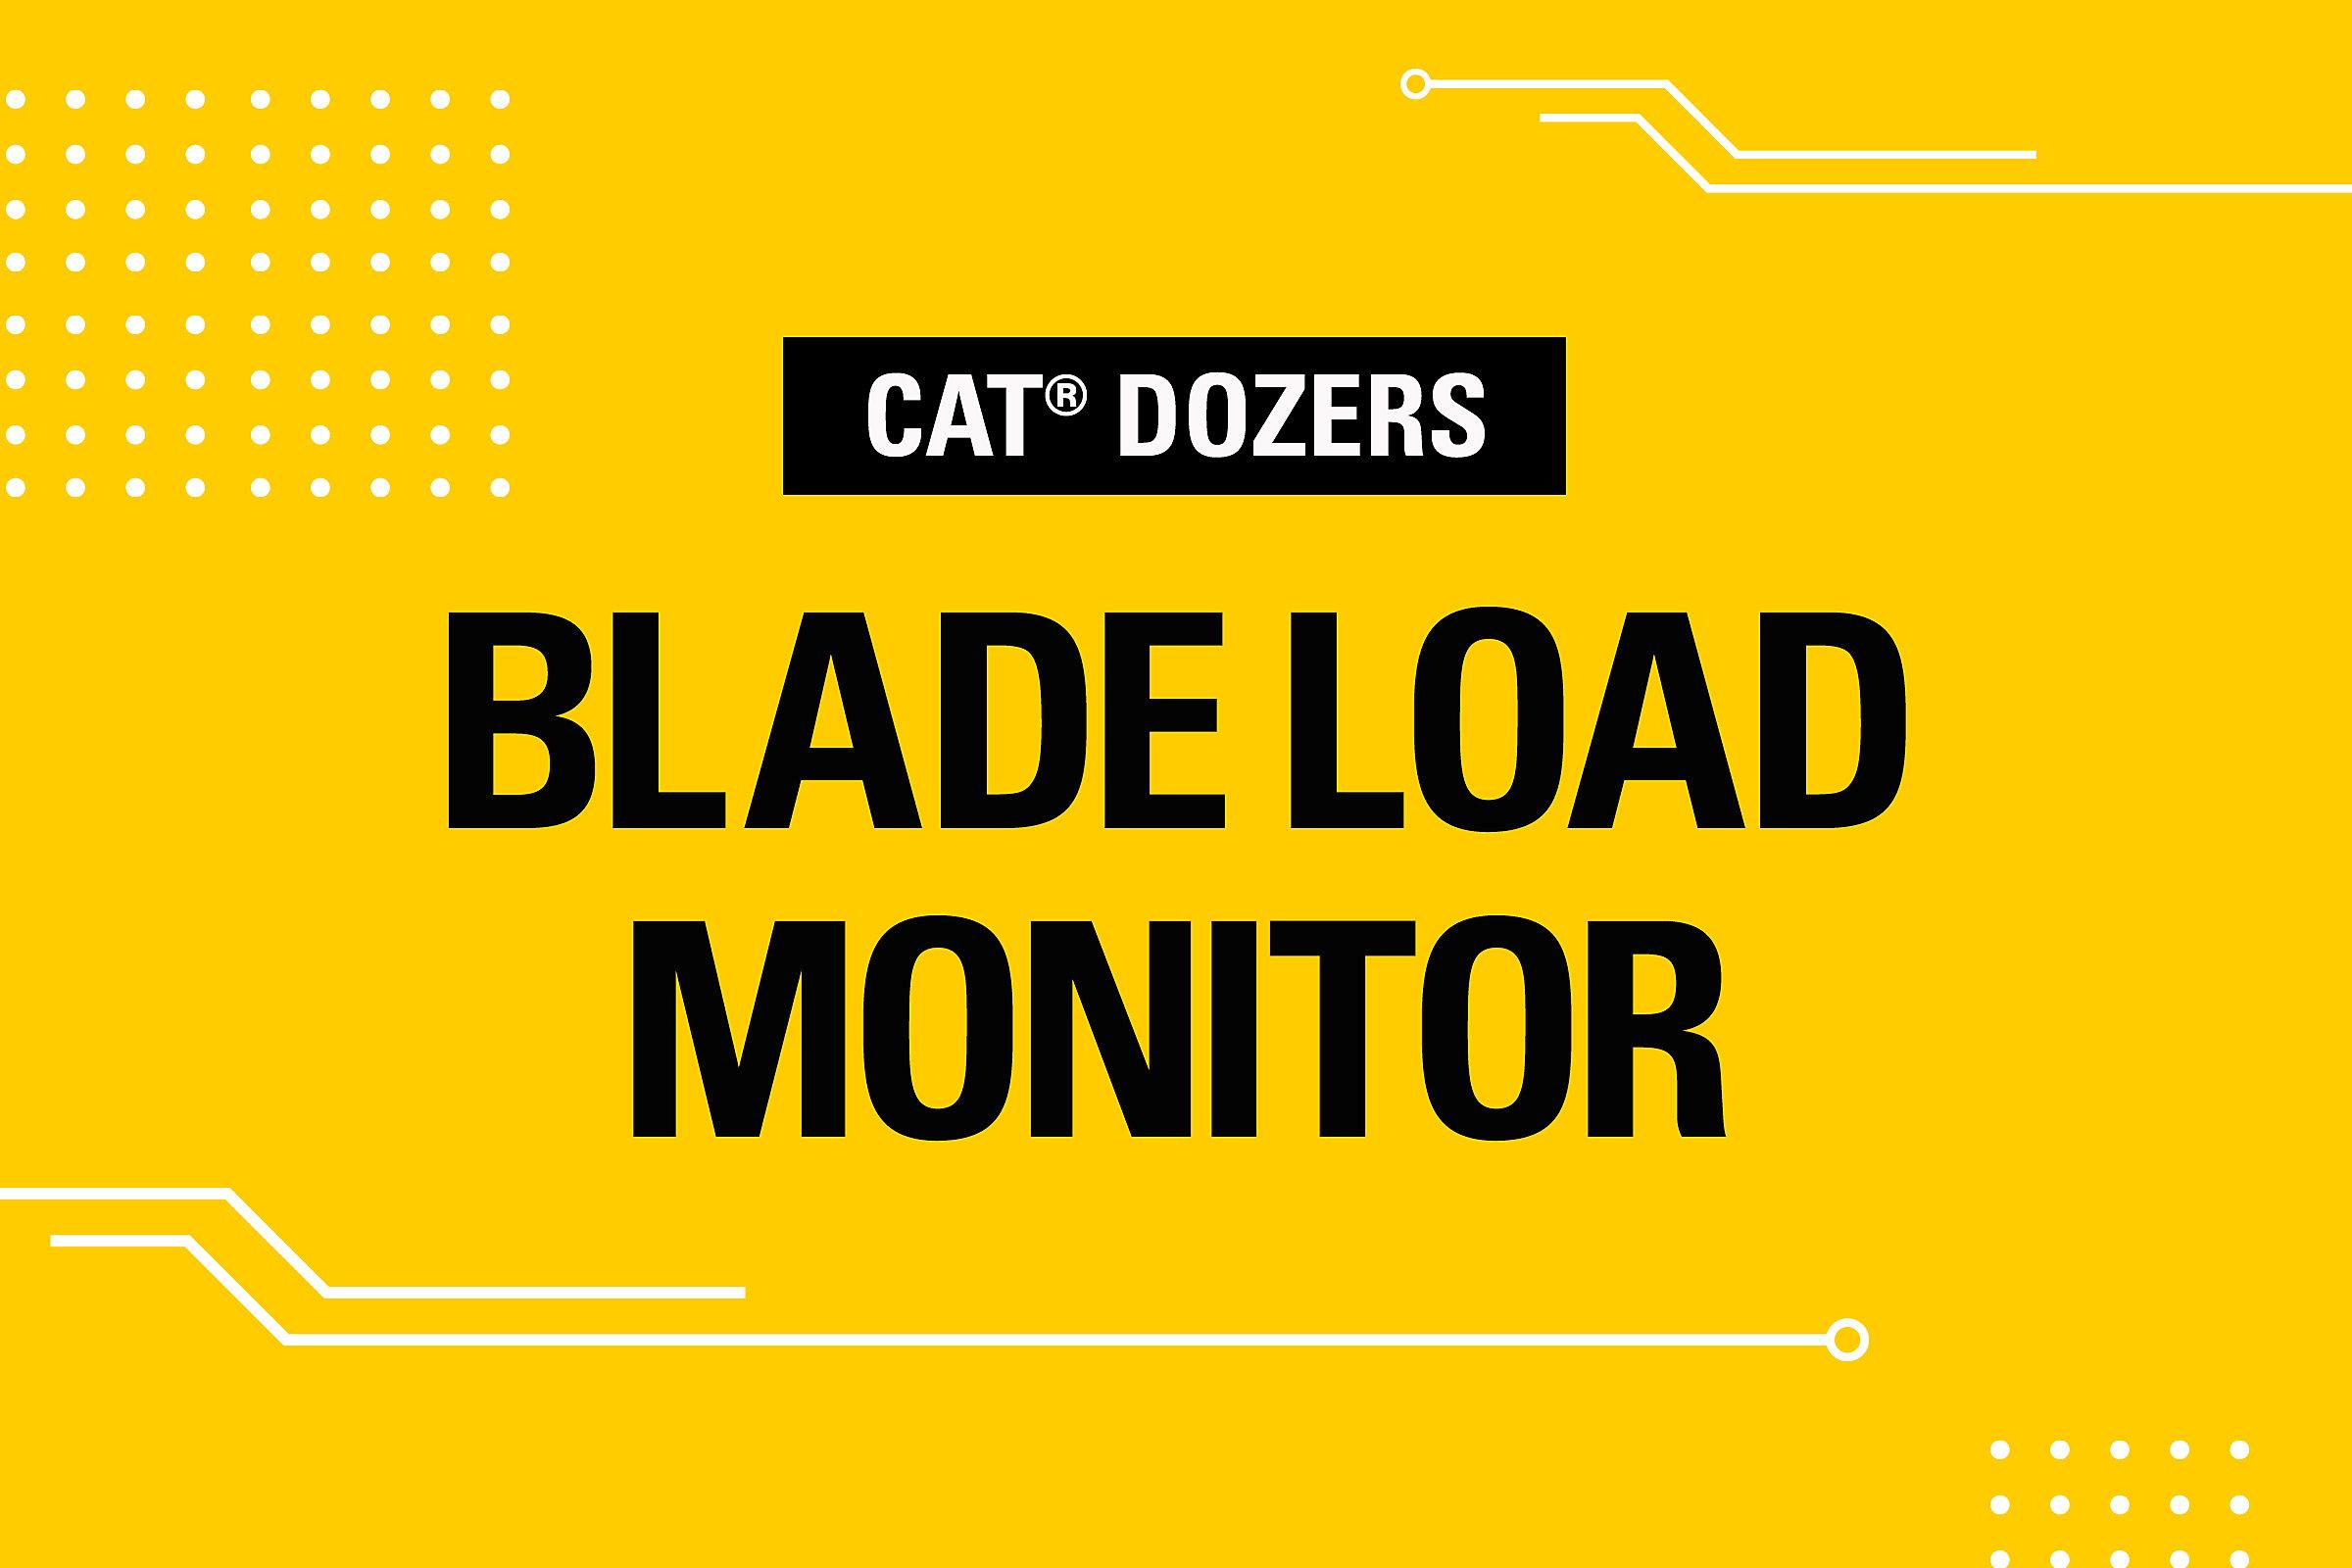 Blade Load Monitor